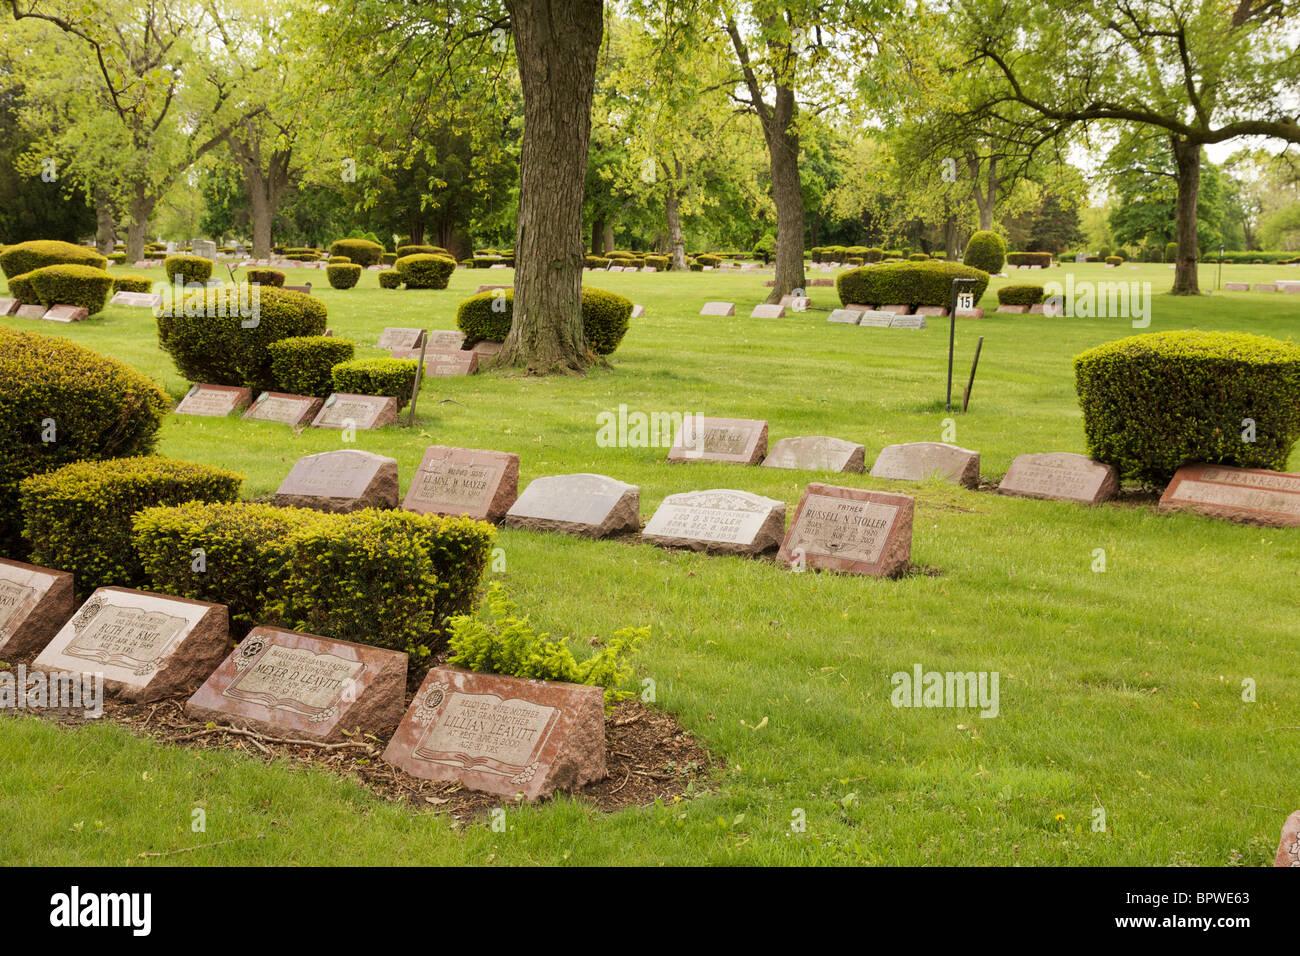 Jewish cemetery near Chicago. - Stock Image